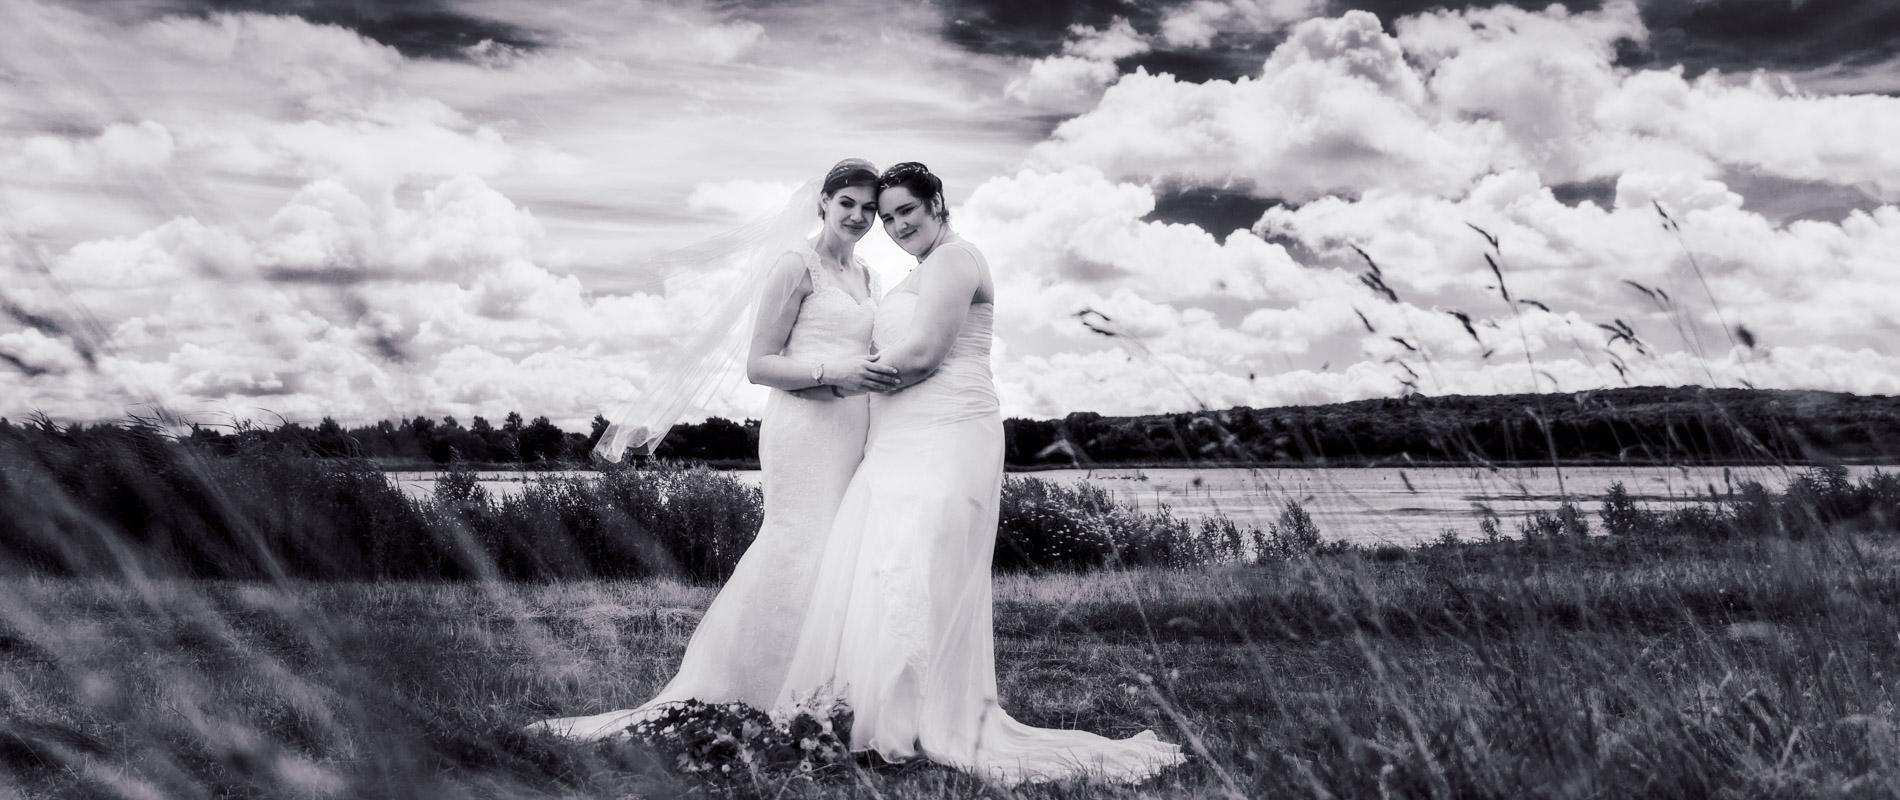 lesbian wedding photography kent